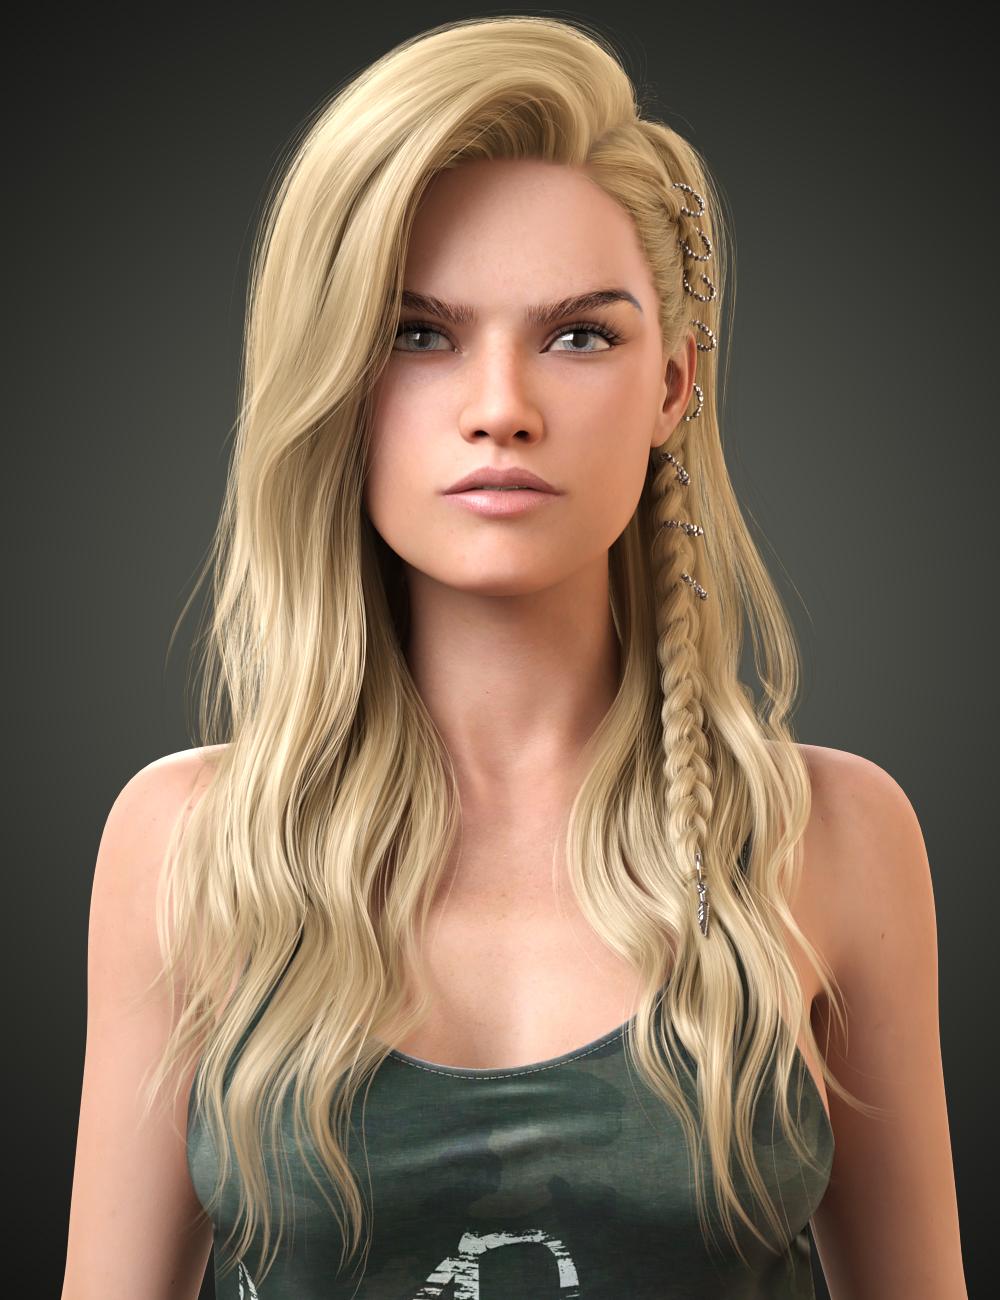 Ellie Hair for Genesis 8 Females by: WindField, 3D Models by Daz 3D